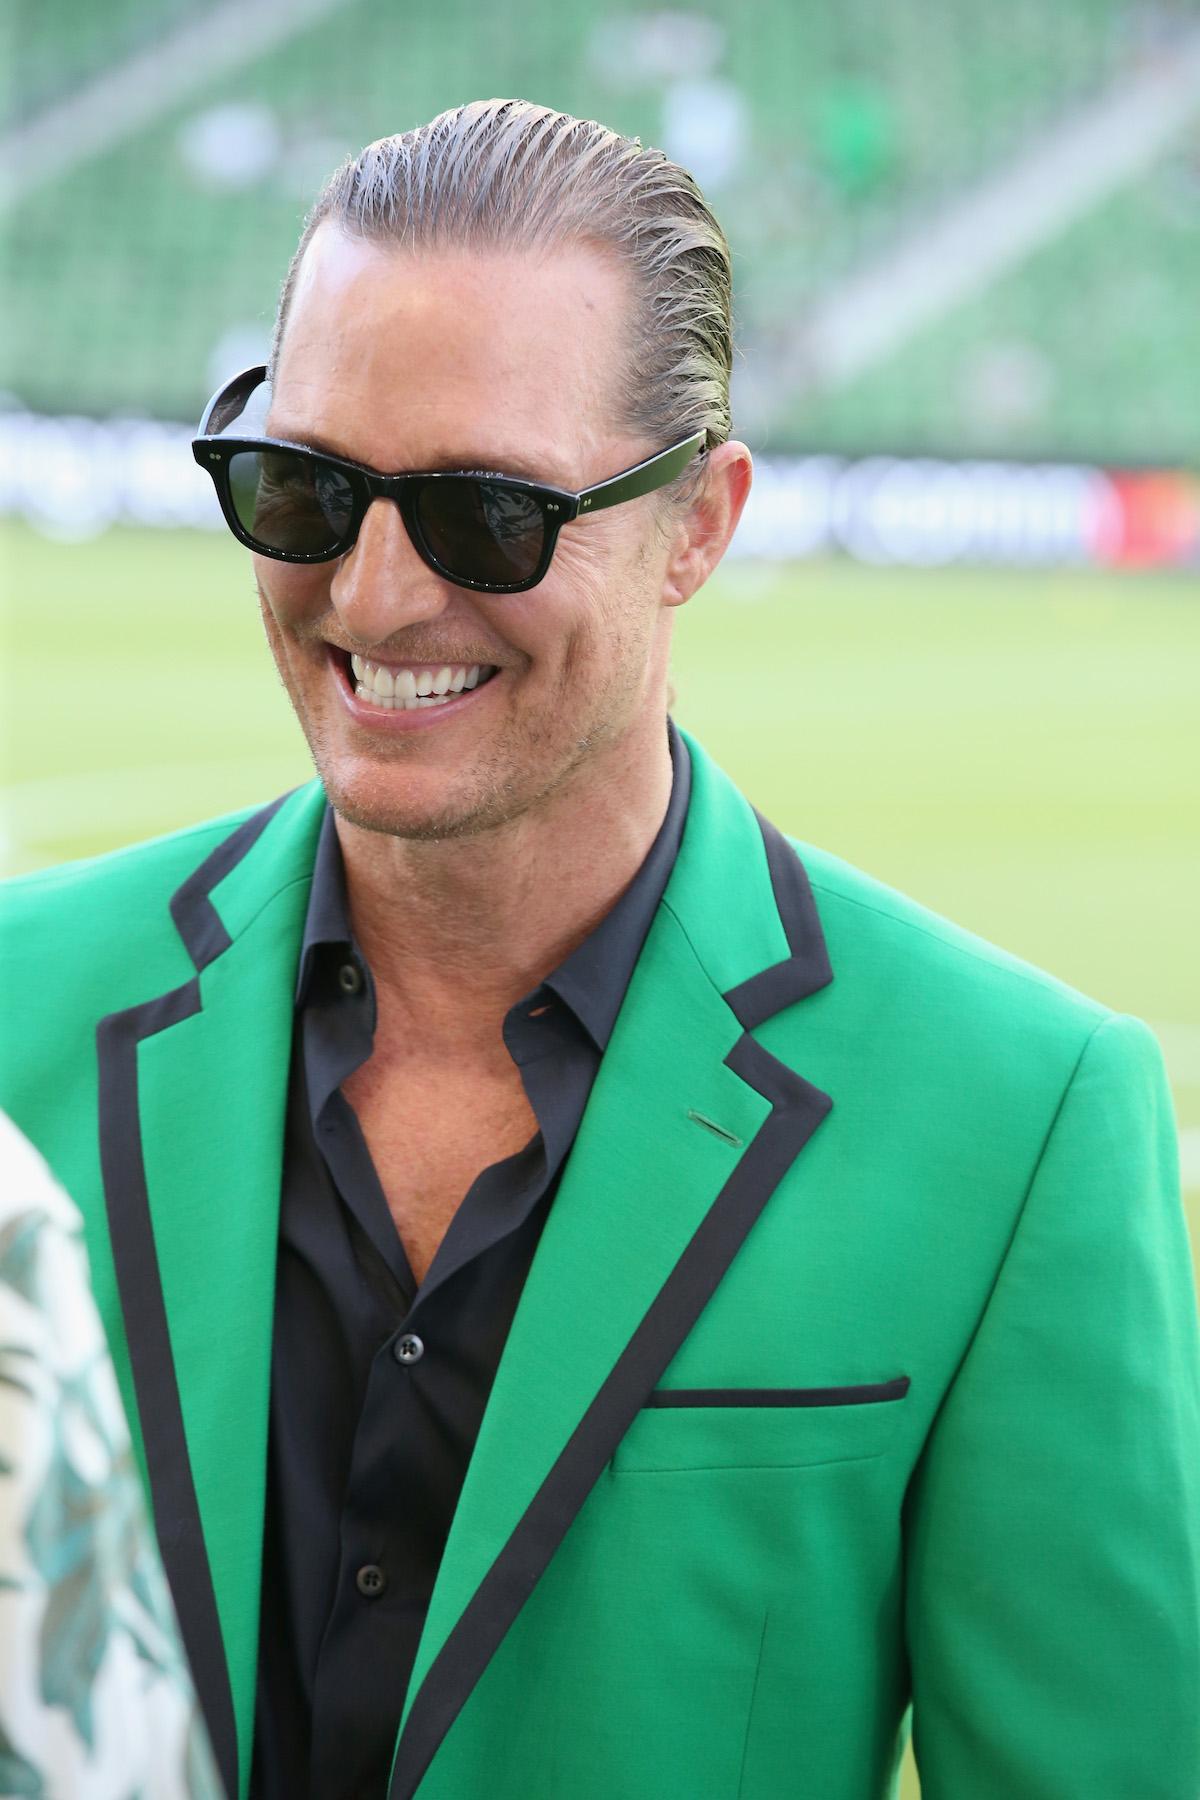 Matthew McConaughey wearing a green blazer and sunglasses smiling